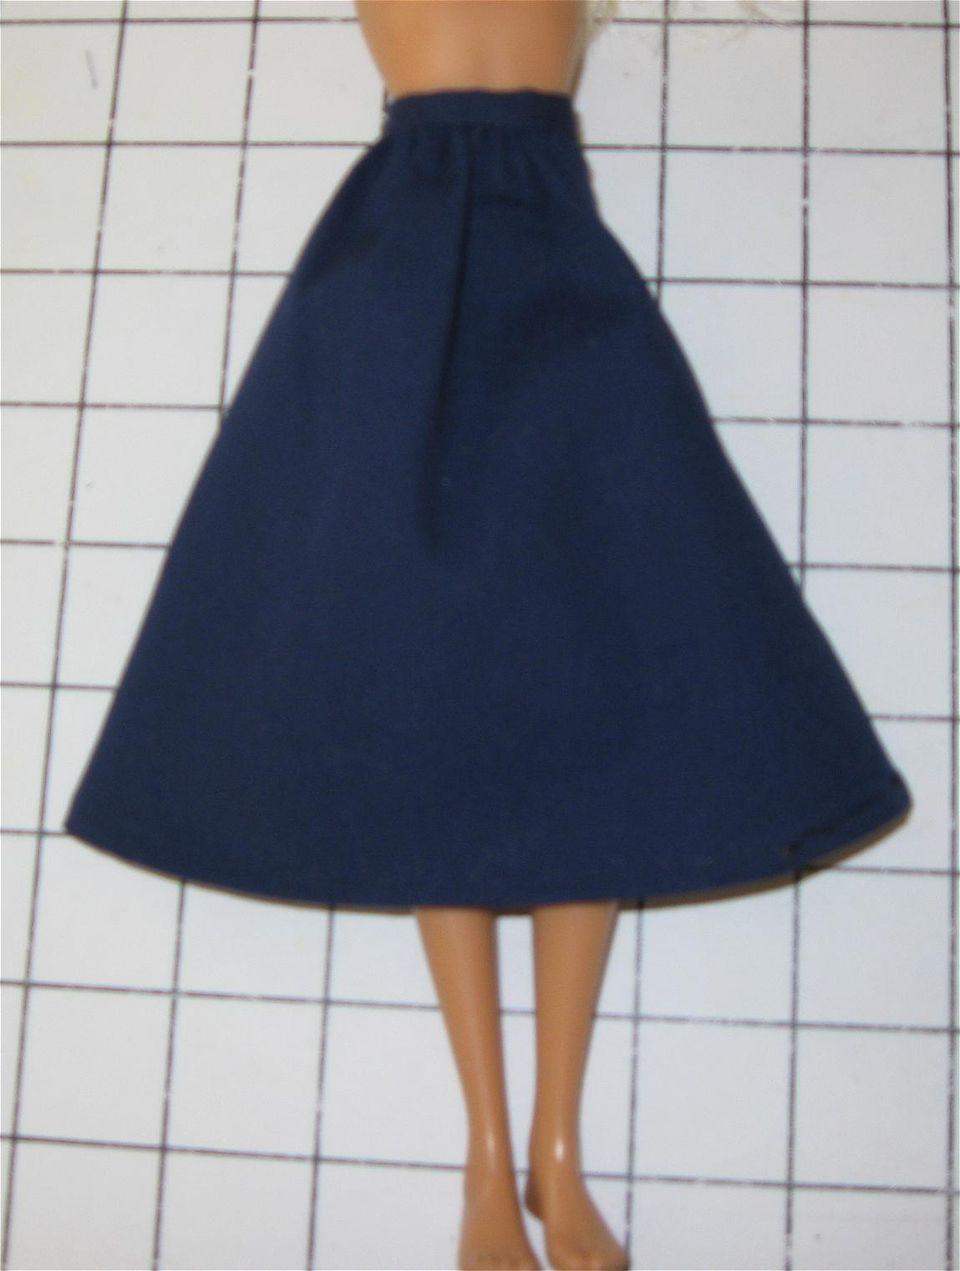 Sew a Fashion Doll or Barbie Skirt